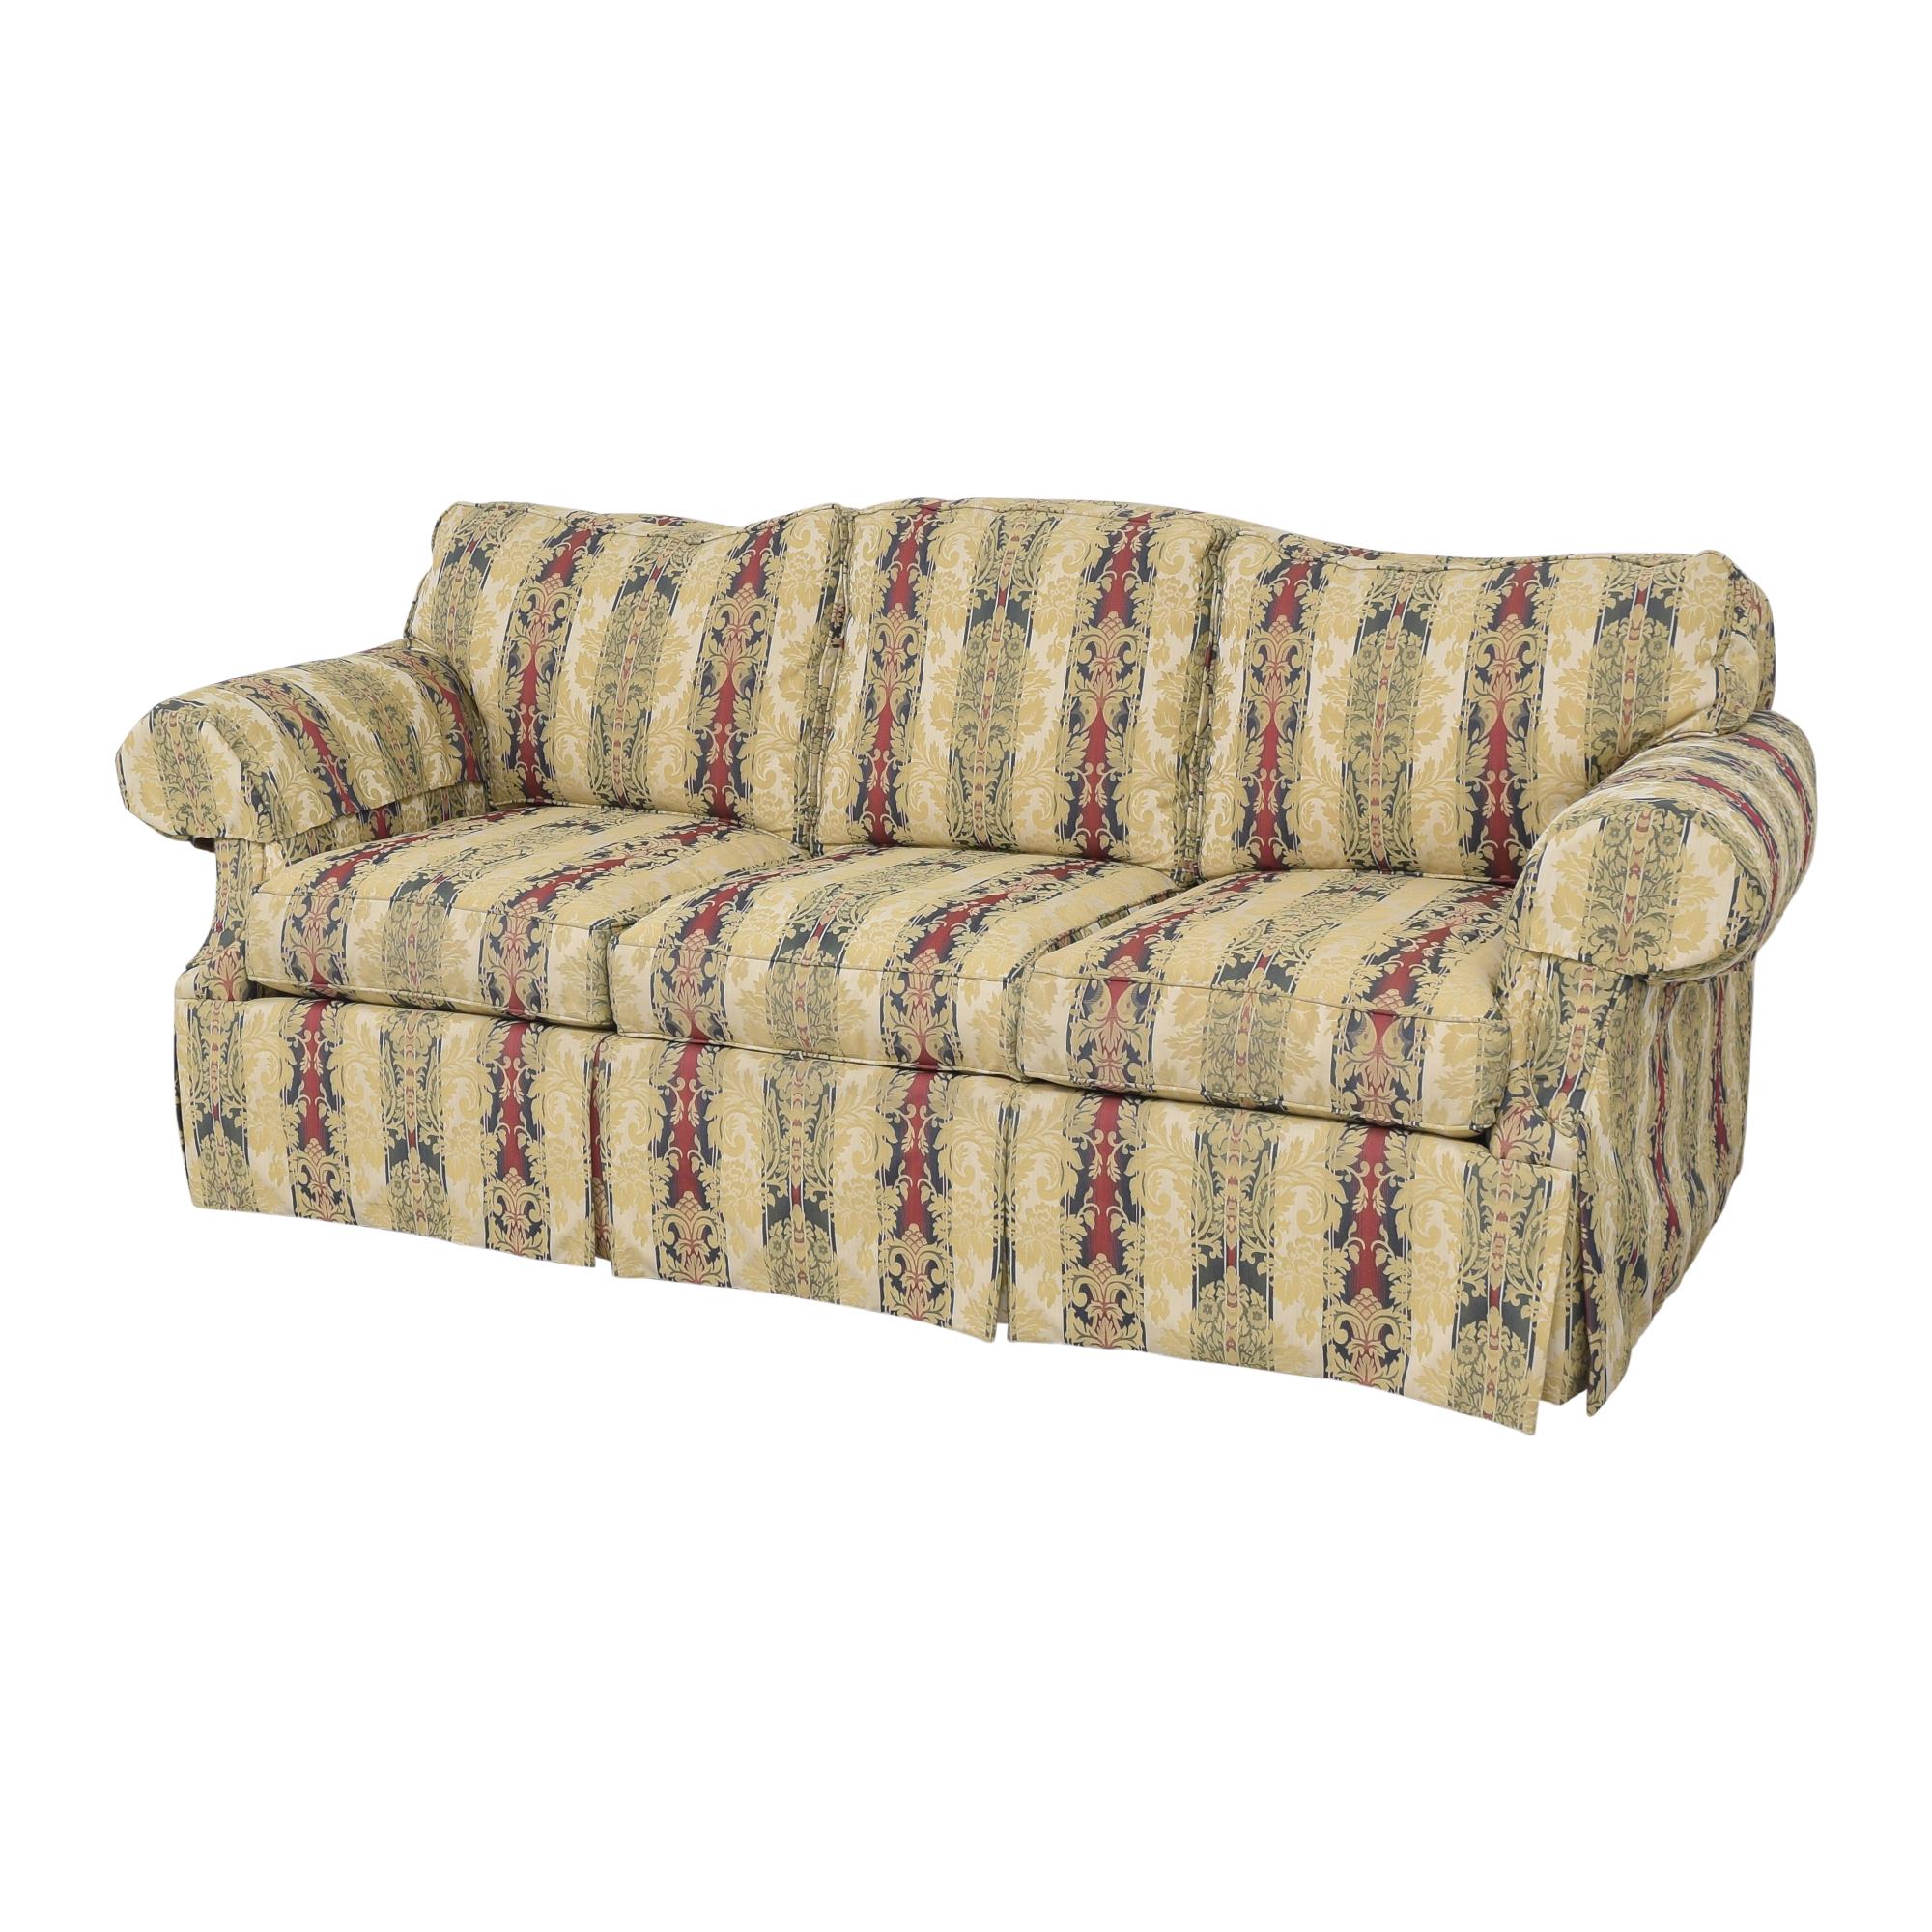 Ethan Allen Stripe Damask Sofa / Sofas